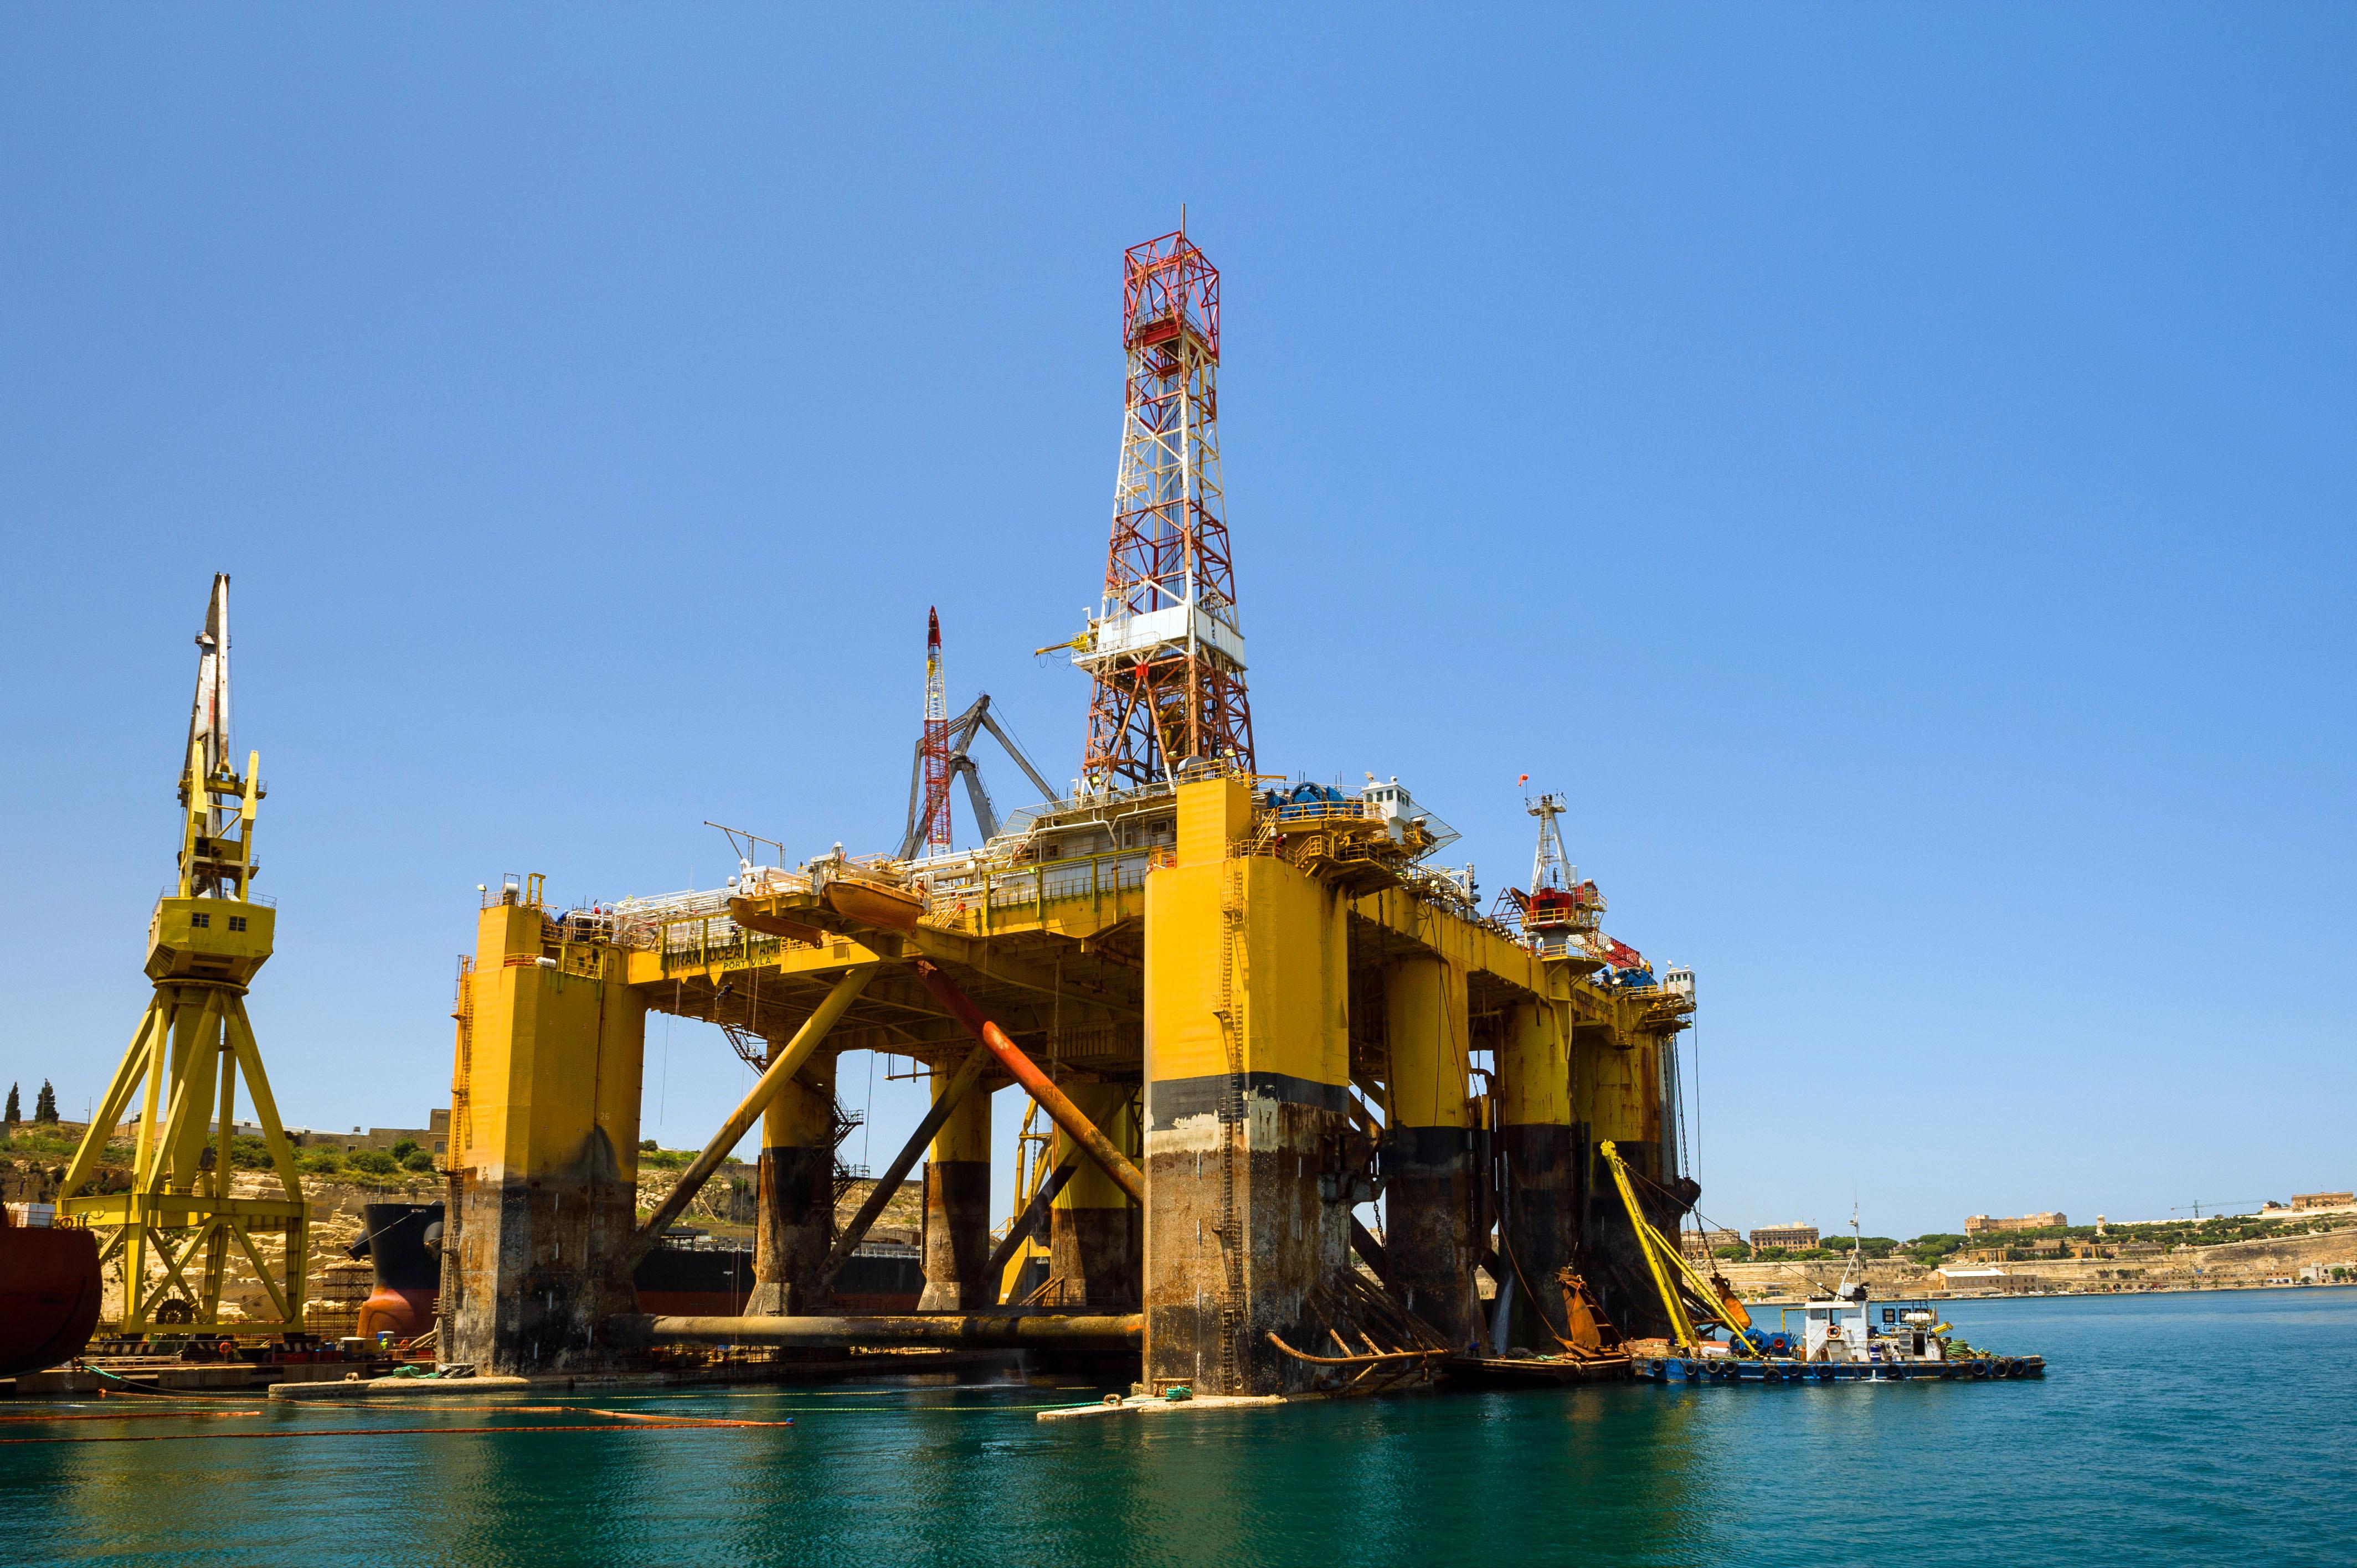 Transocean Drilling Rig, undergoing maintenance in the harbour of Valletta, Malta.